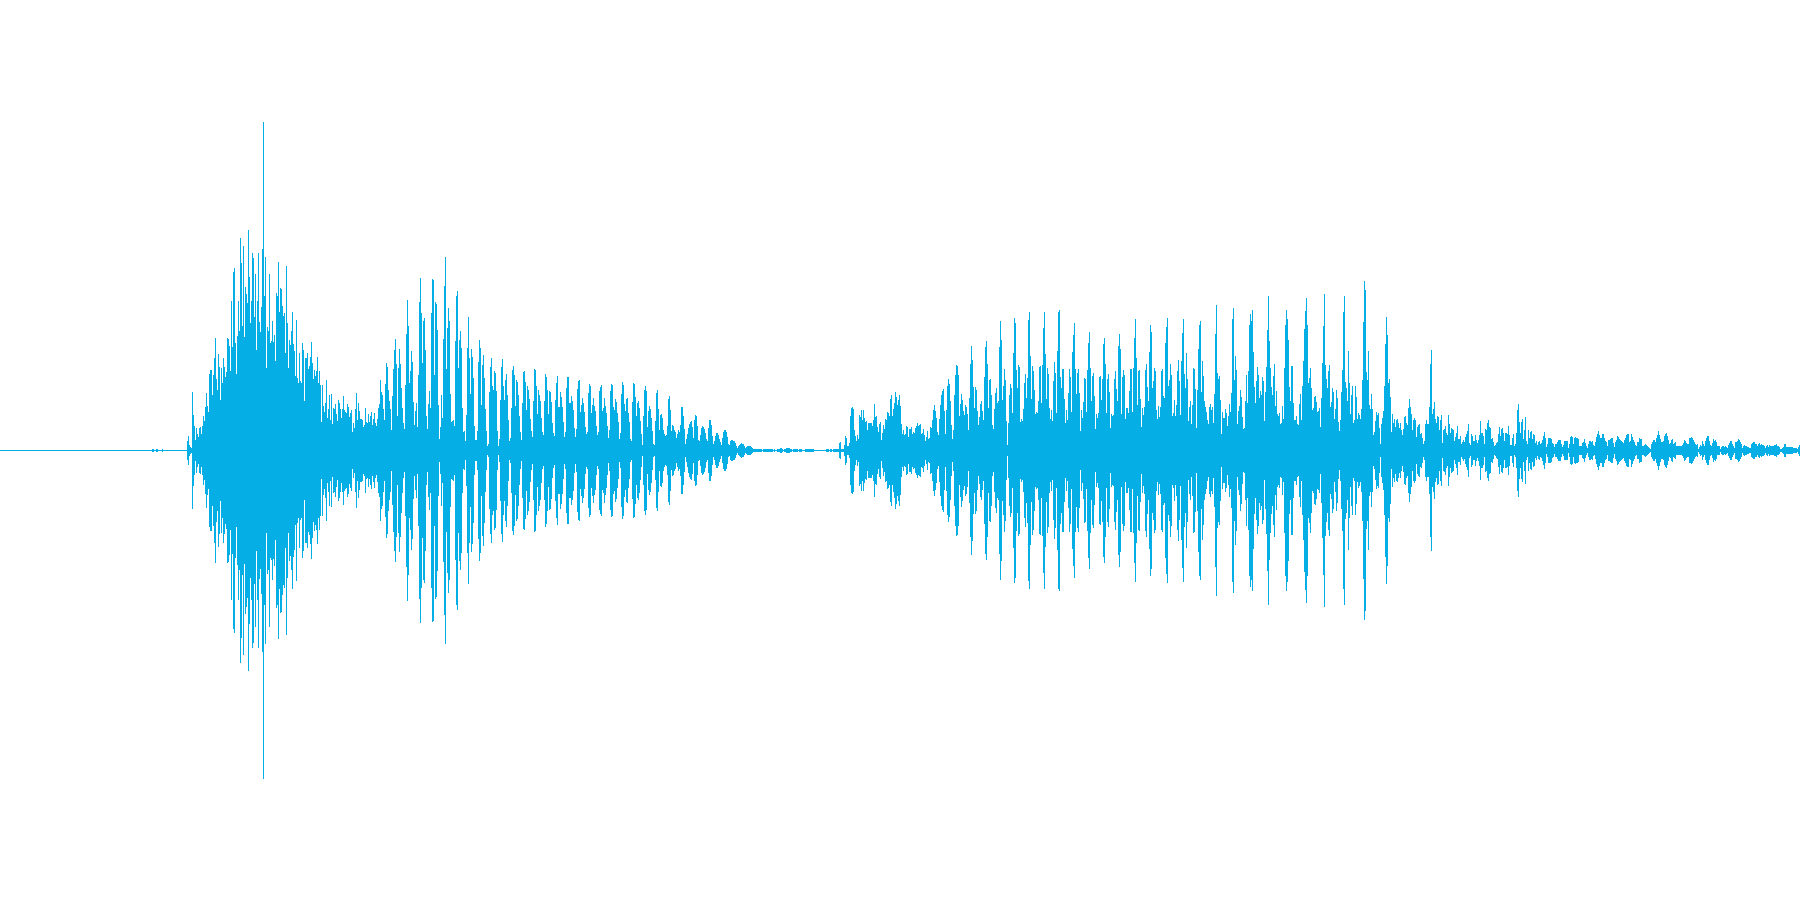 「2 PM」英語発音の再生済みの波形